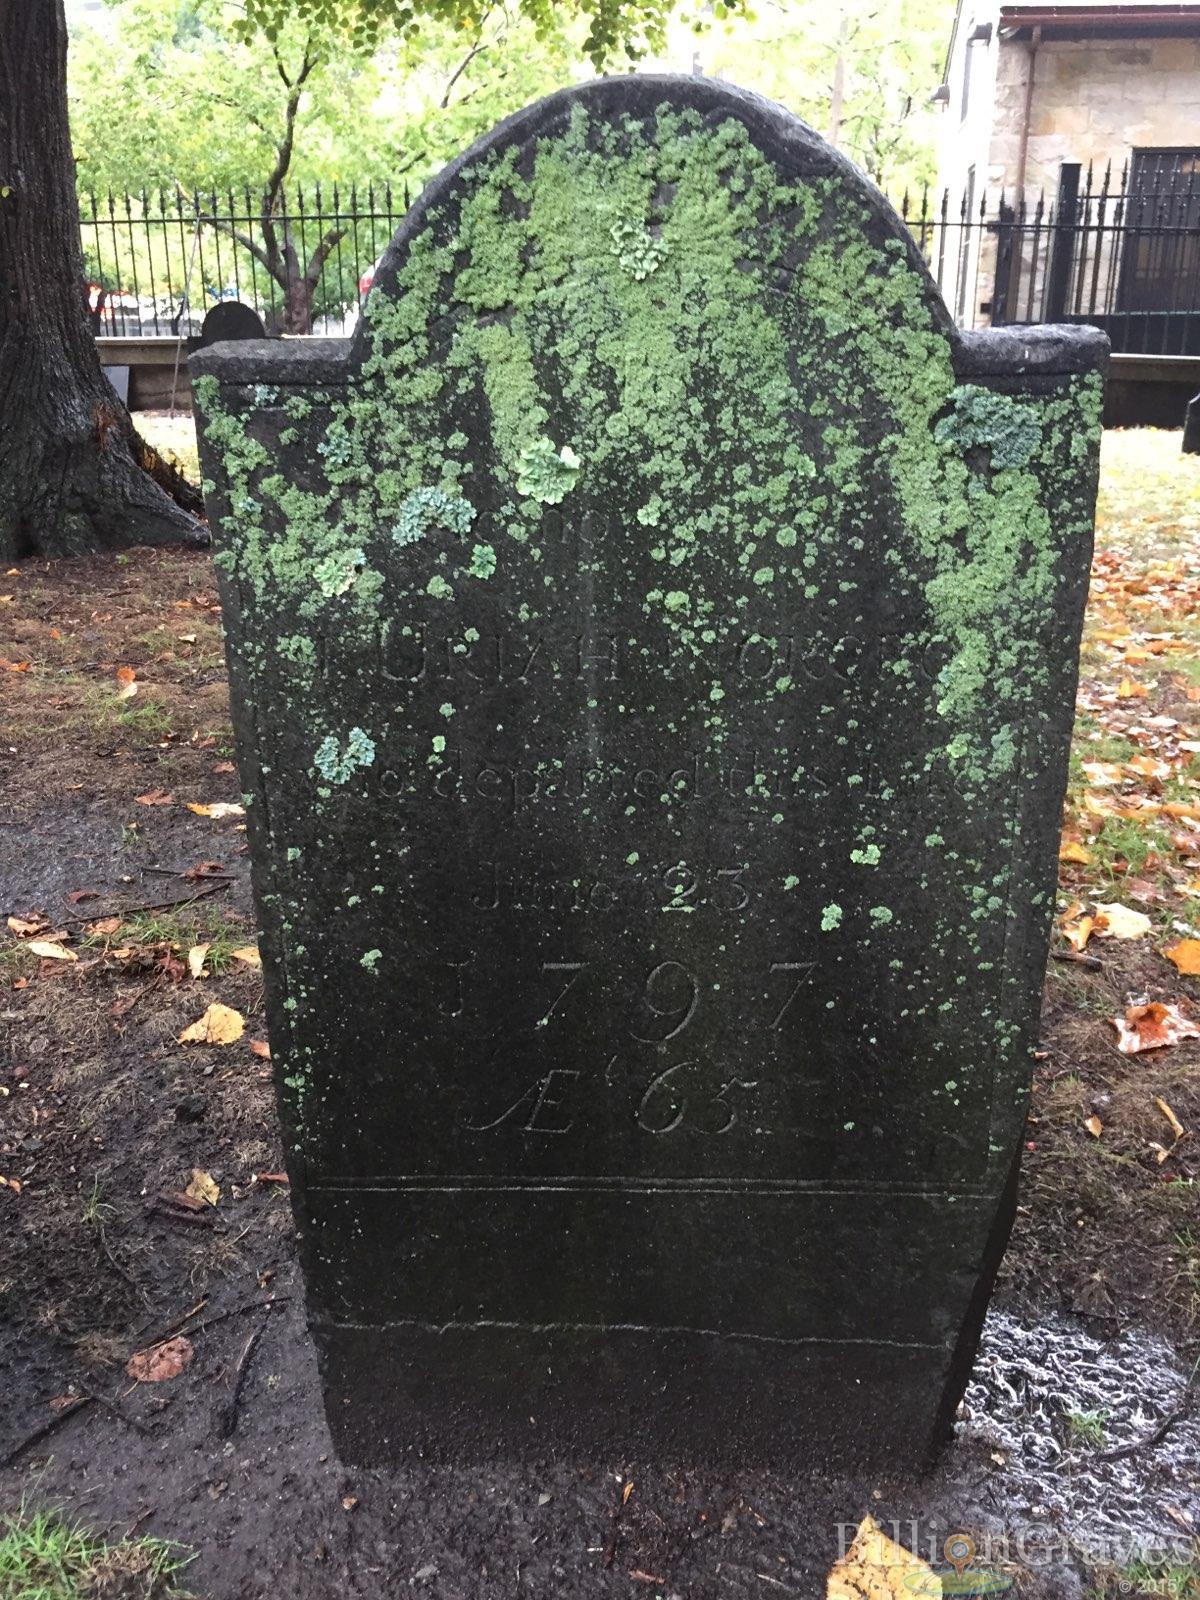 BillionGraves, gravestone, grave, damaged gravestones, cemetery, family history, ancestors, community service project, JustServe, BillionGraves app, ivy, plant growth, JustServe, lichen